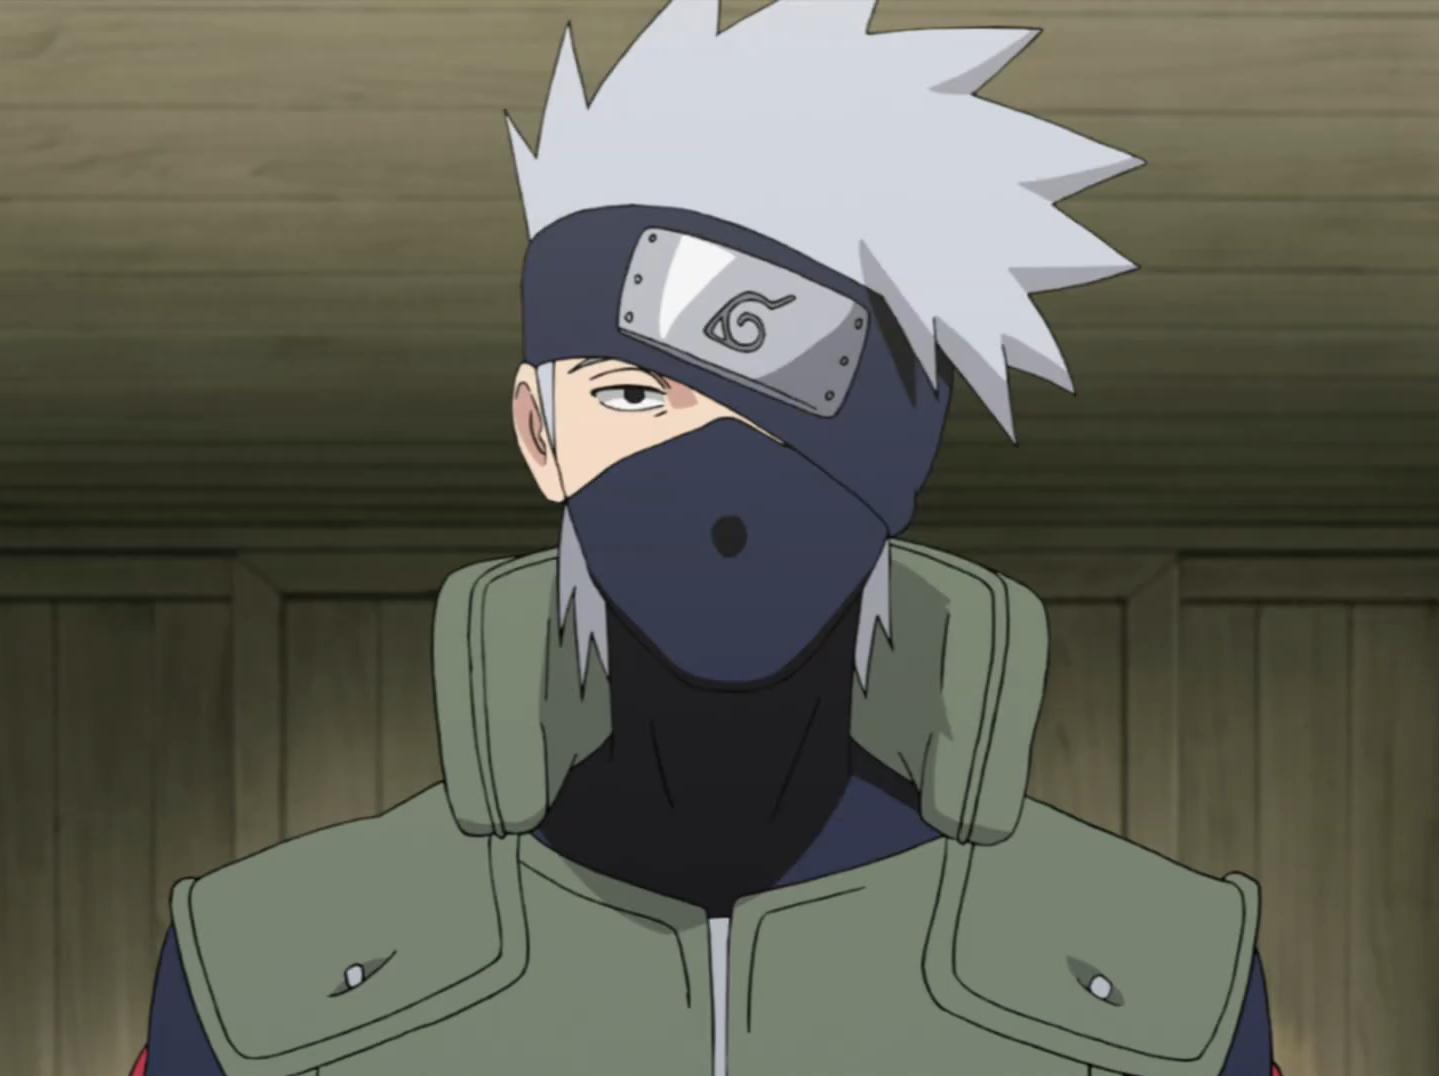 Kakashi Hatake | Narutopedia | FANDOM powered by Wikia